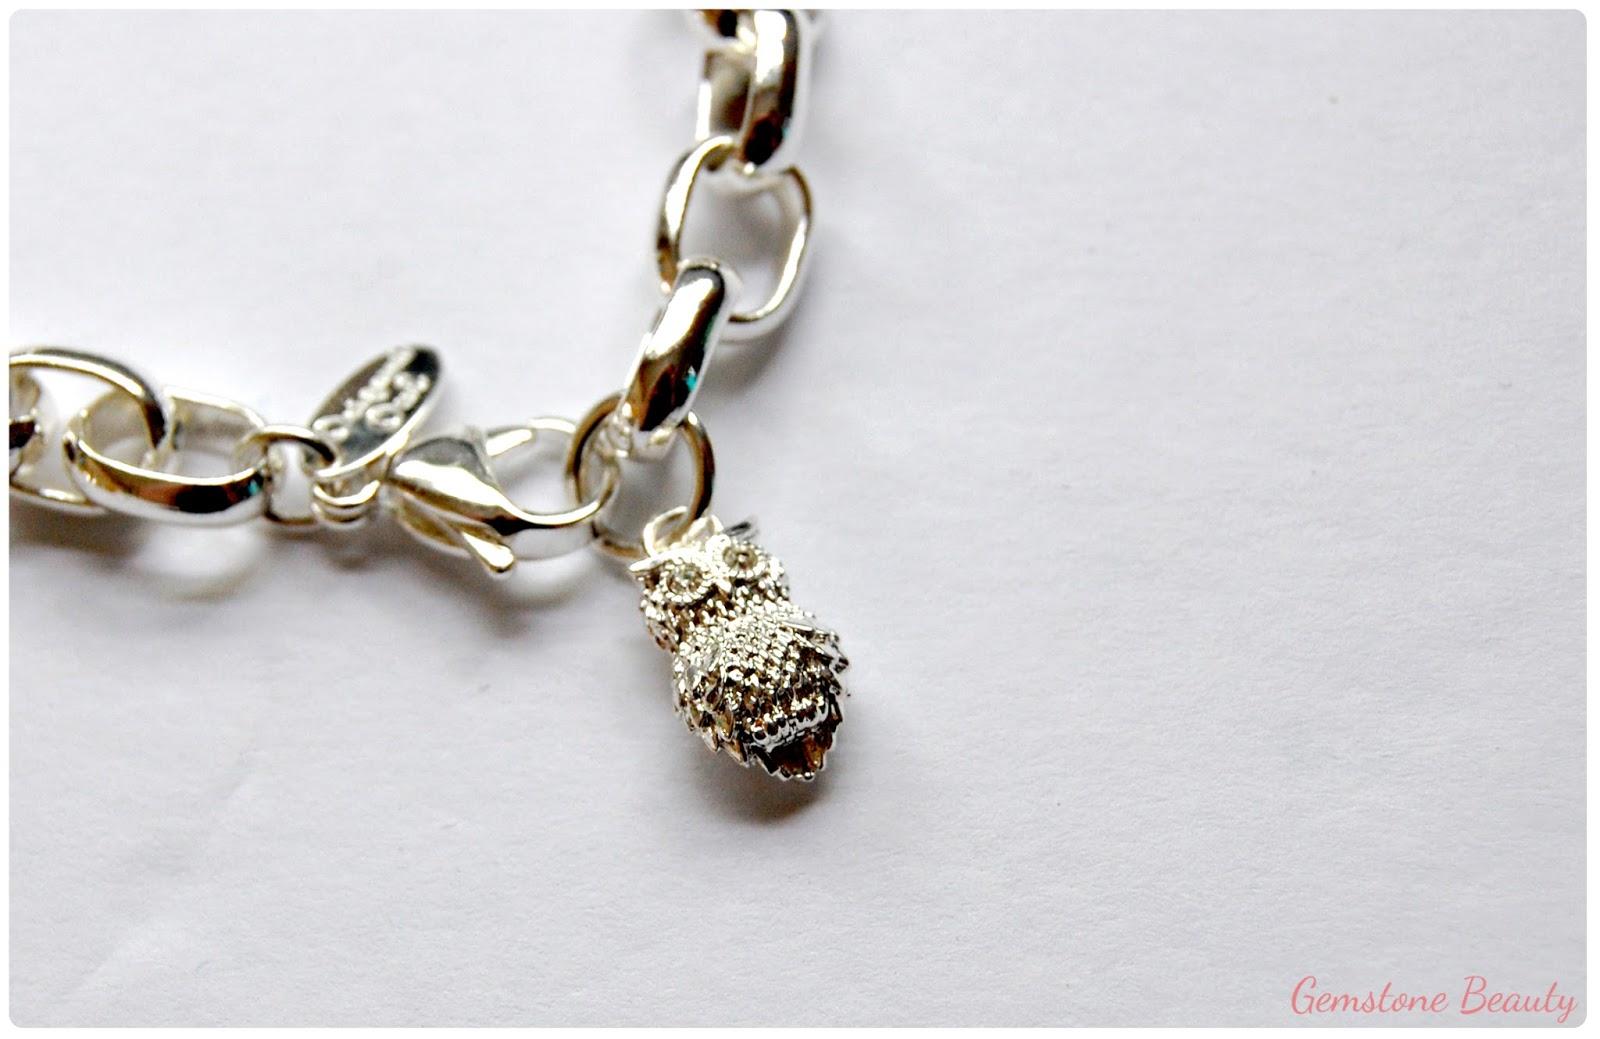 Gemstone Beauty: A Personal birthday gift: Origami Owl ... - photo#23